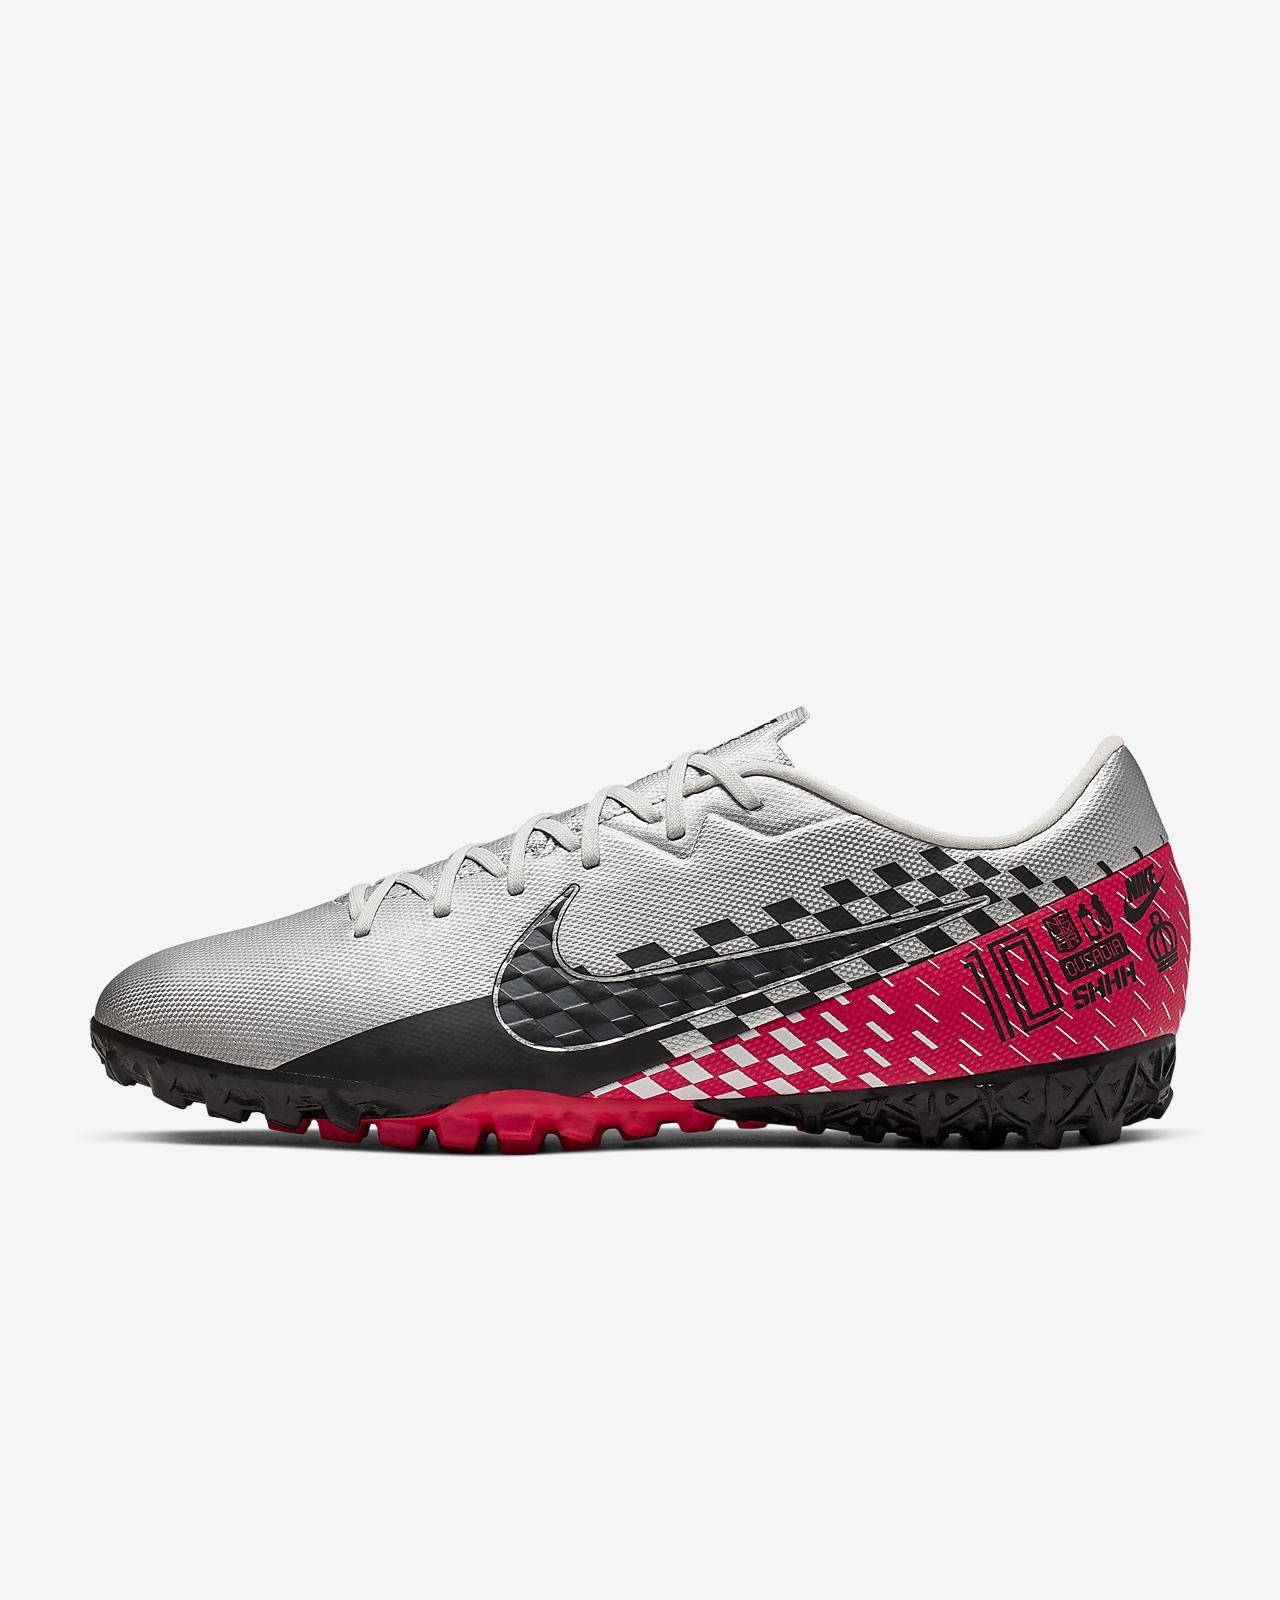 Nike Mercurial Vapor 13 Academy Neymar Jr. TF 人工草地足球鞋